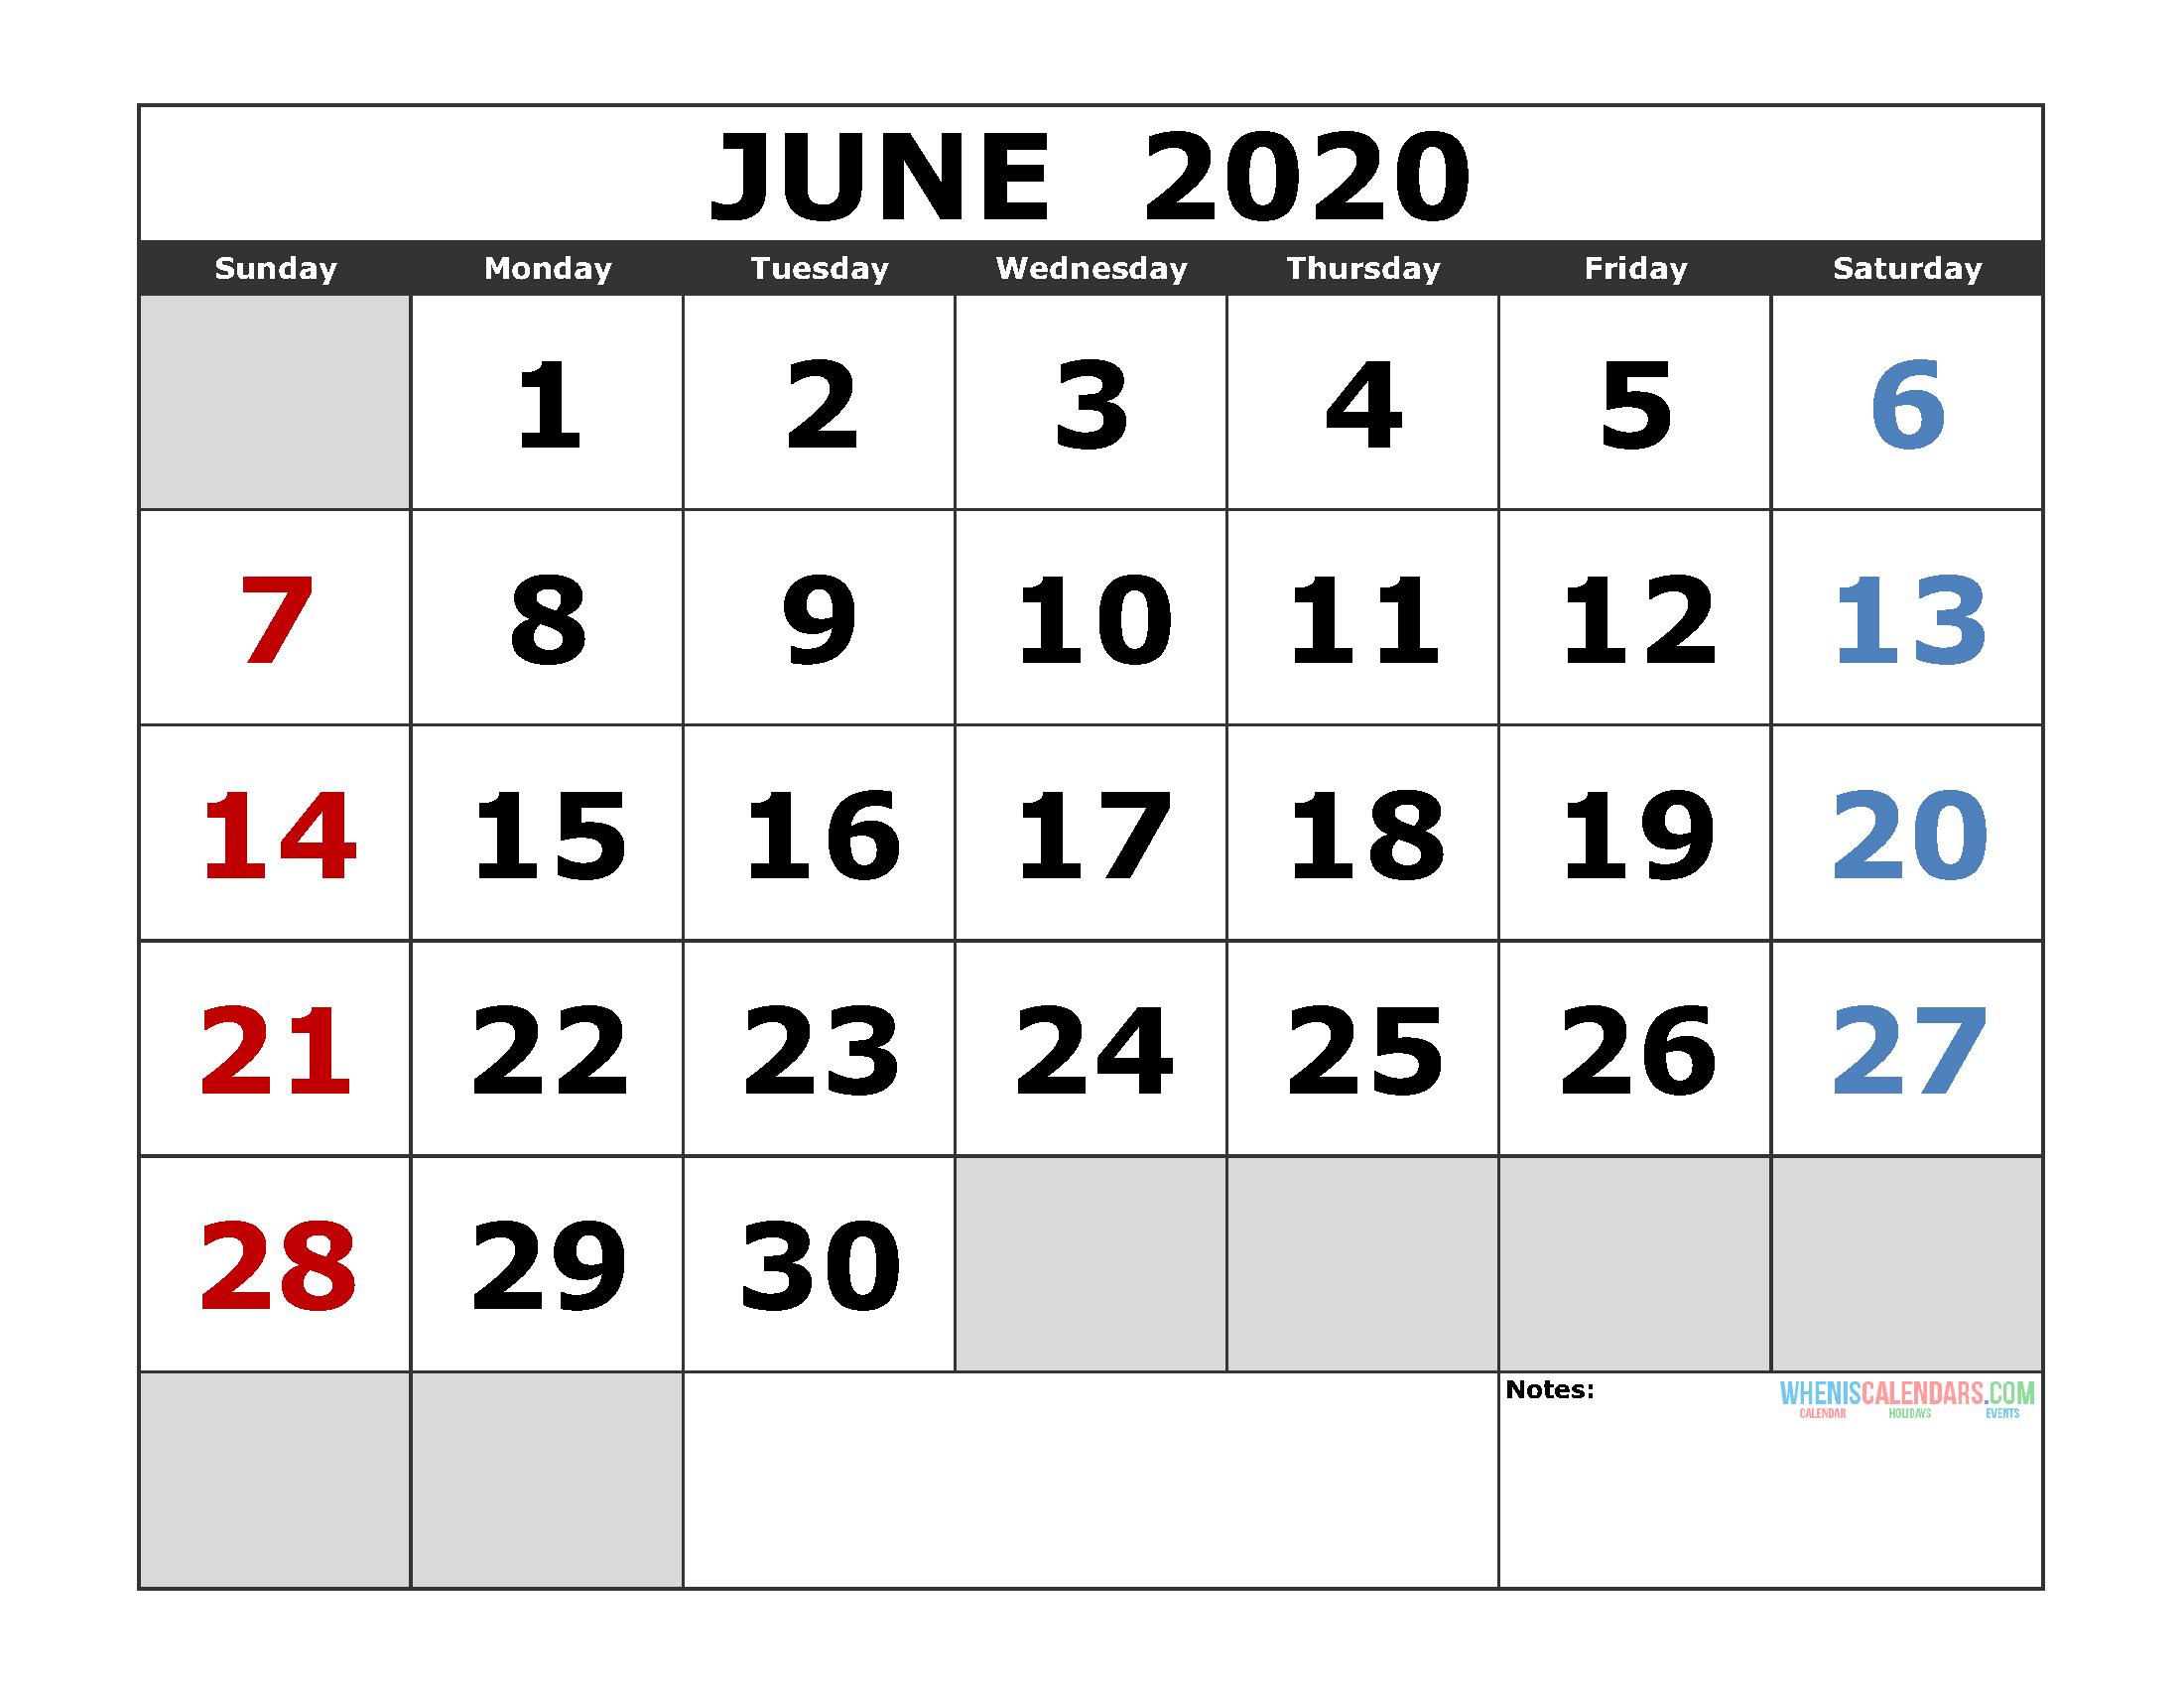 June 2020 Printable Calendar Template Excel, Pdf, Image [Us. Edition throughout 2020 Printable Calendar Templates Quarterly